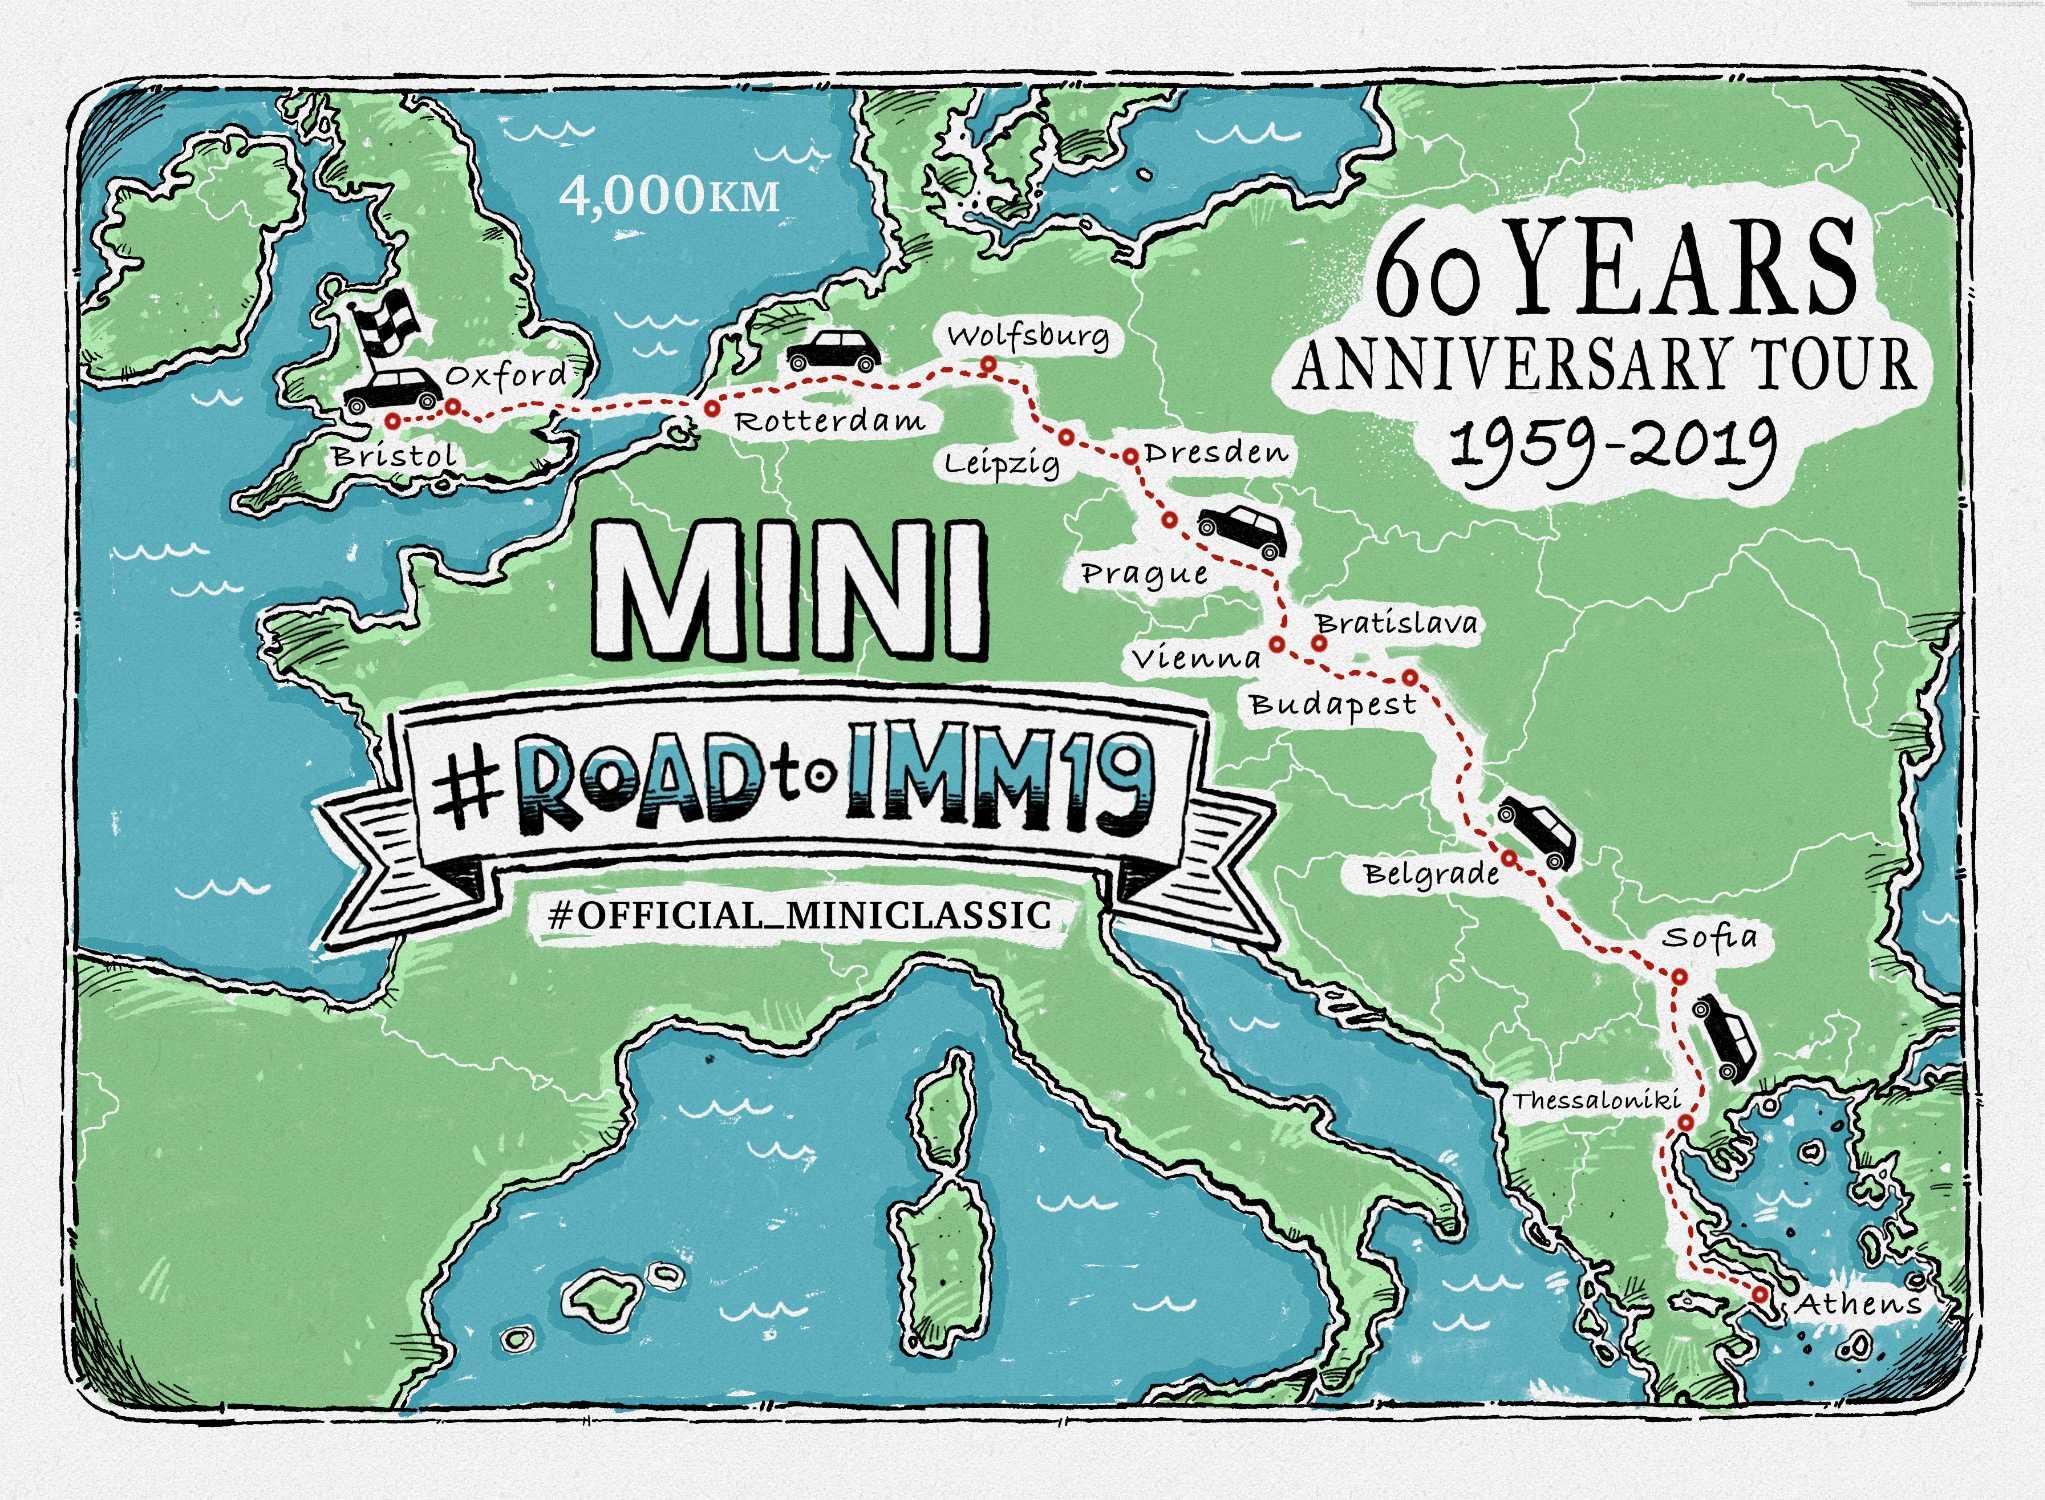 ROADtoIMM19: Driving to the International Mini Meeting 2019